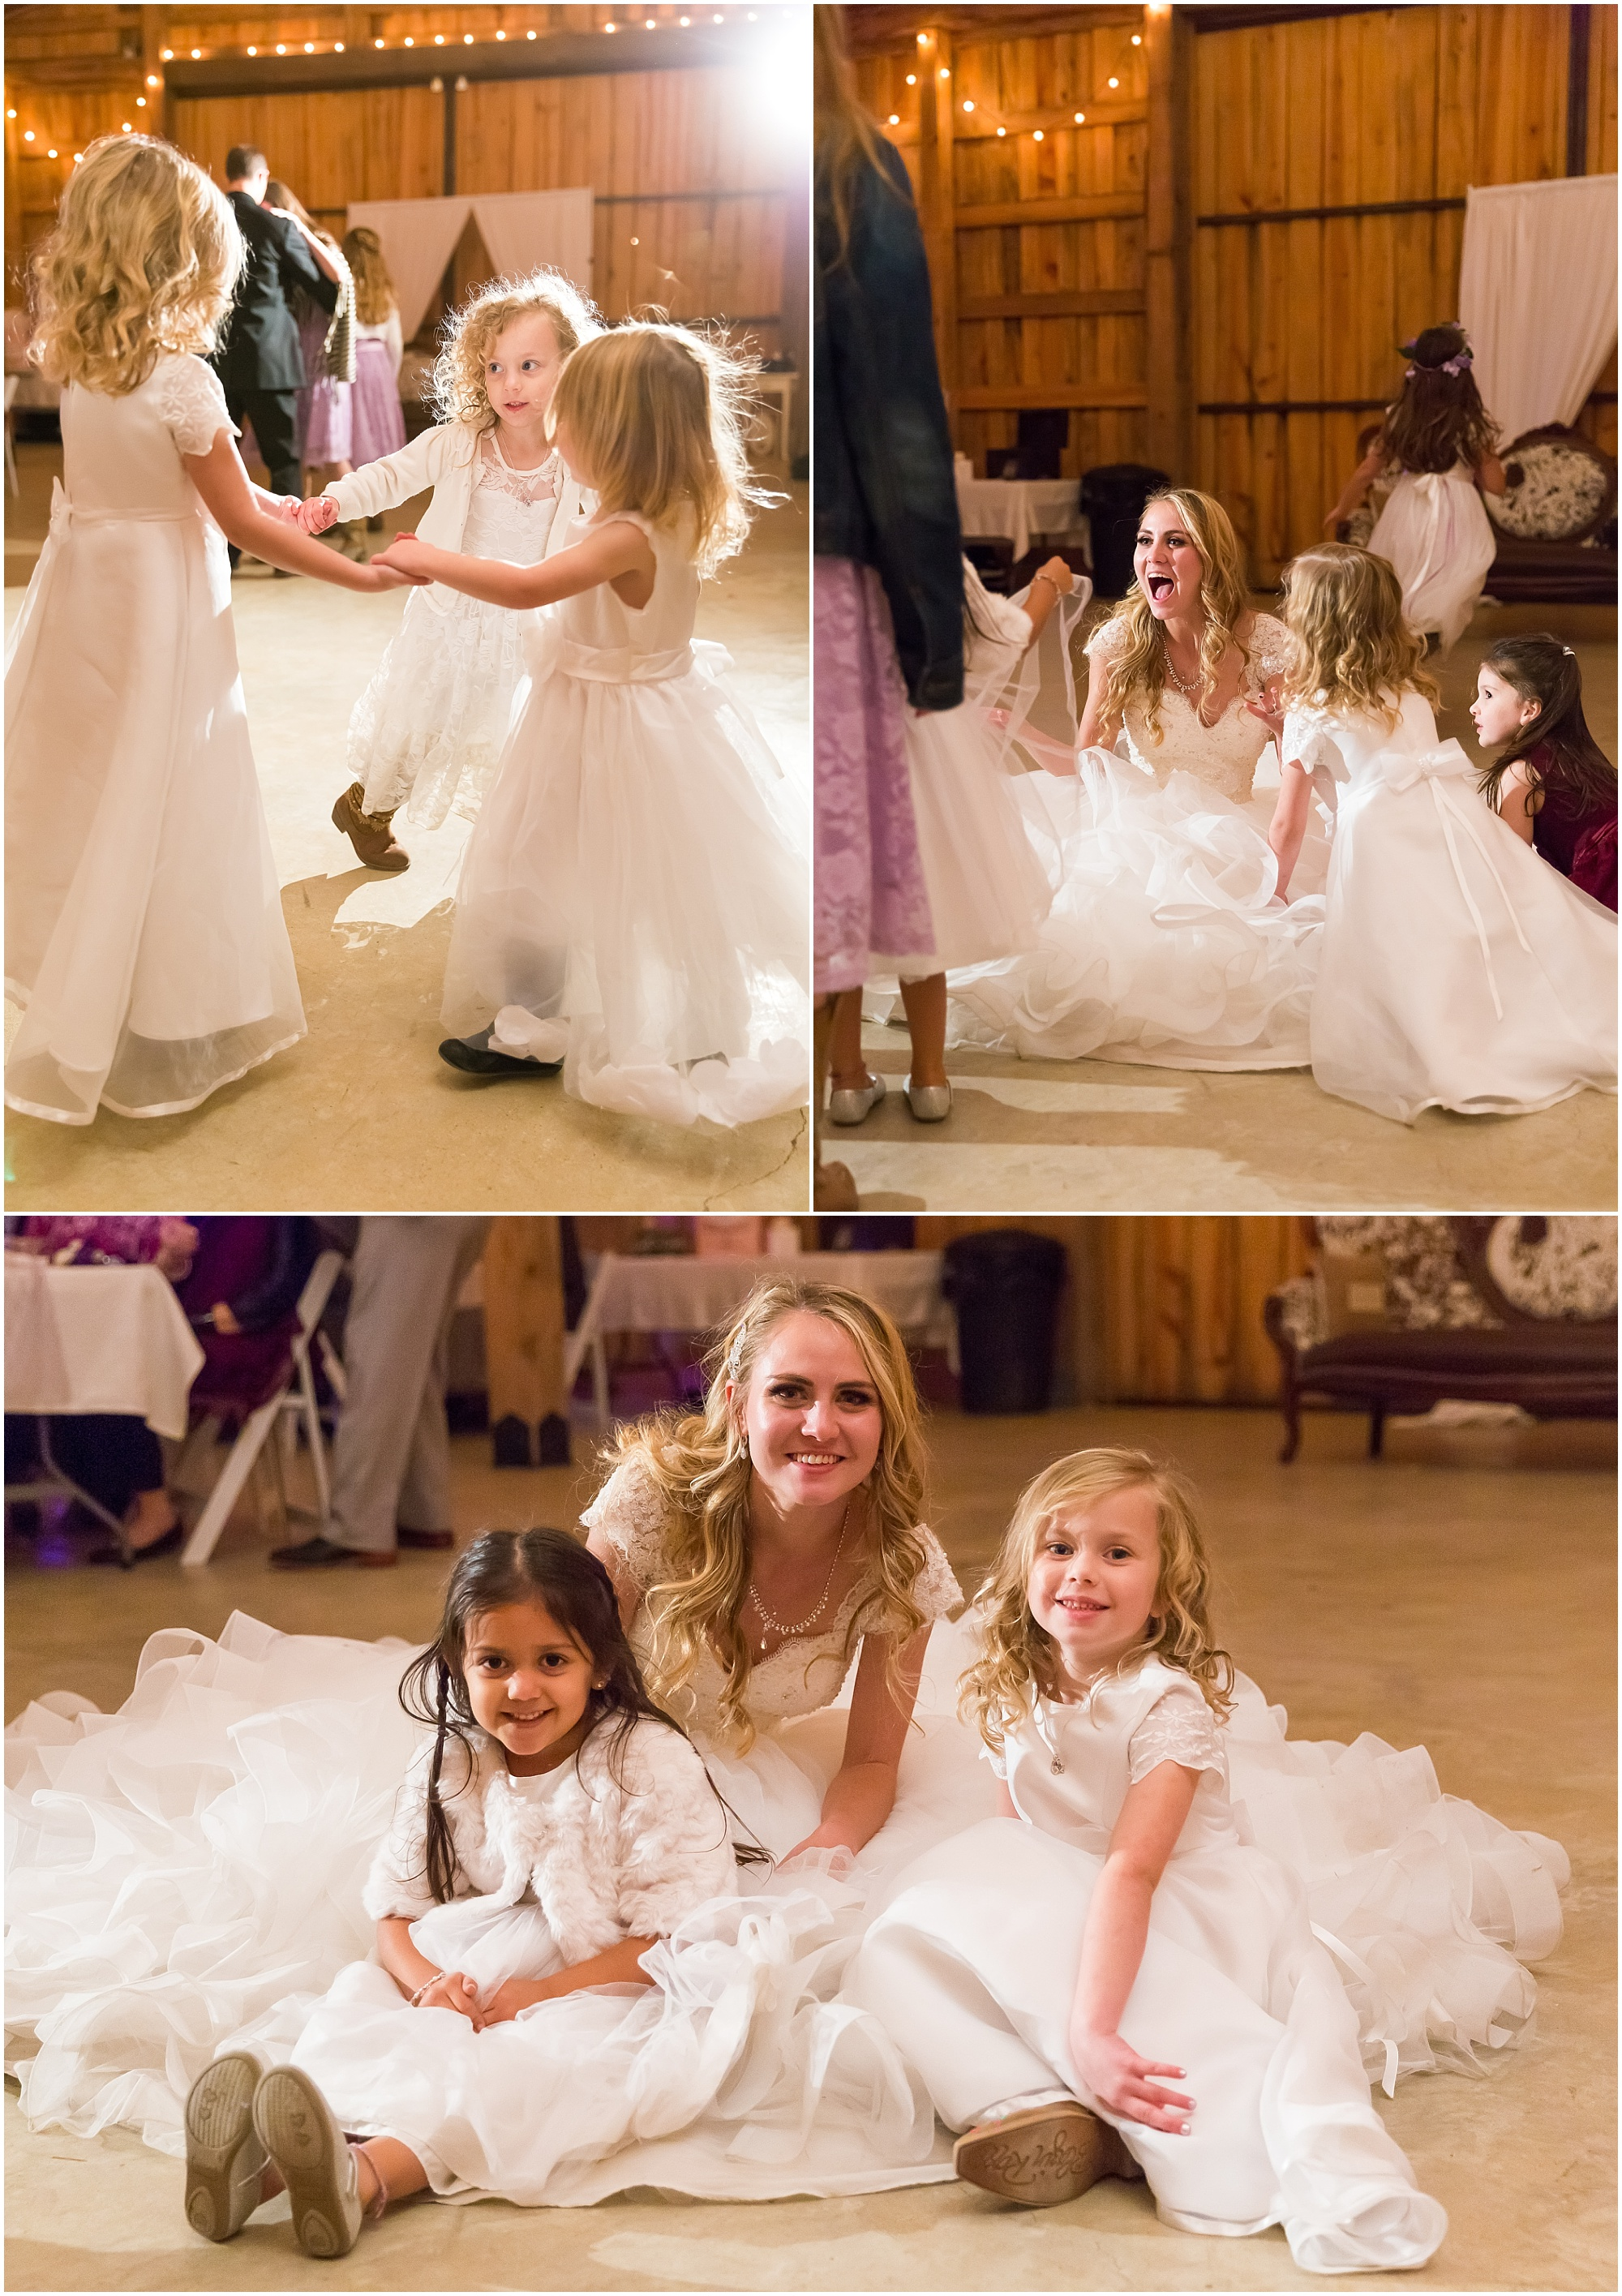 Disney-Inspired-Wedding-Central-Texas_0061.jpg